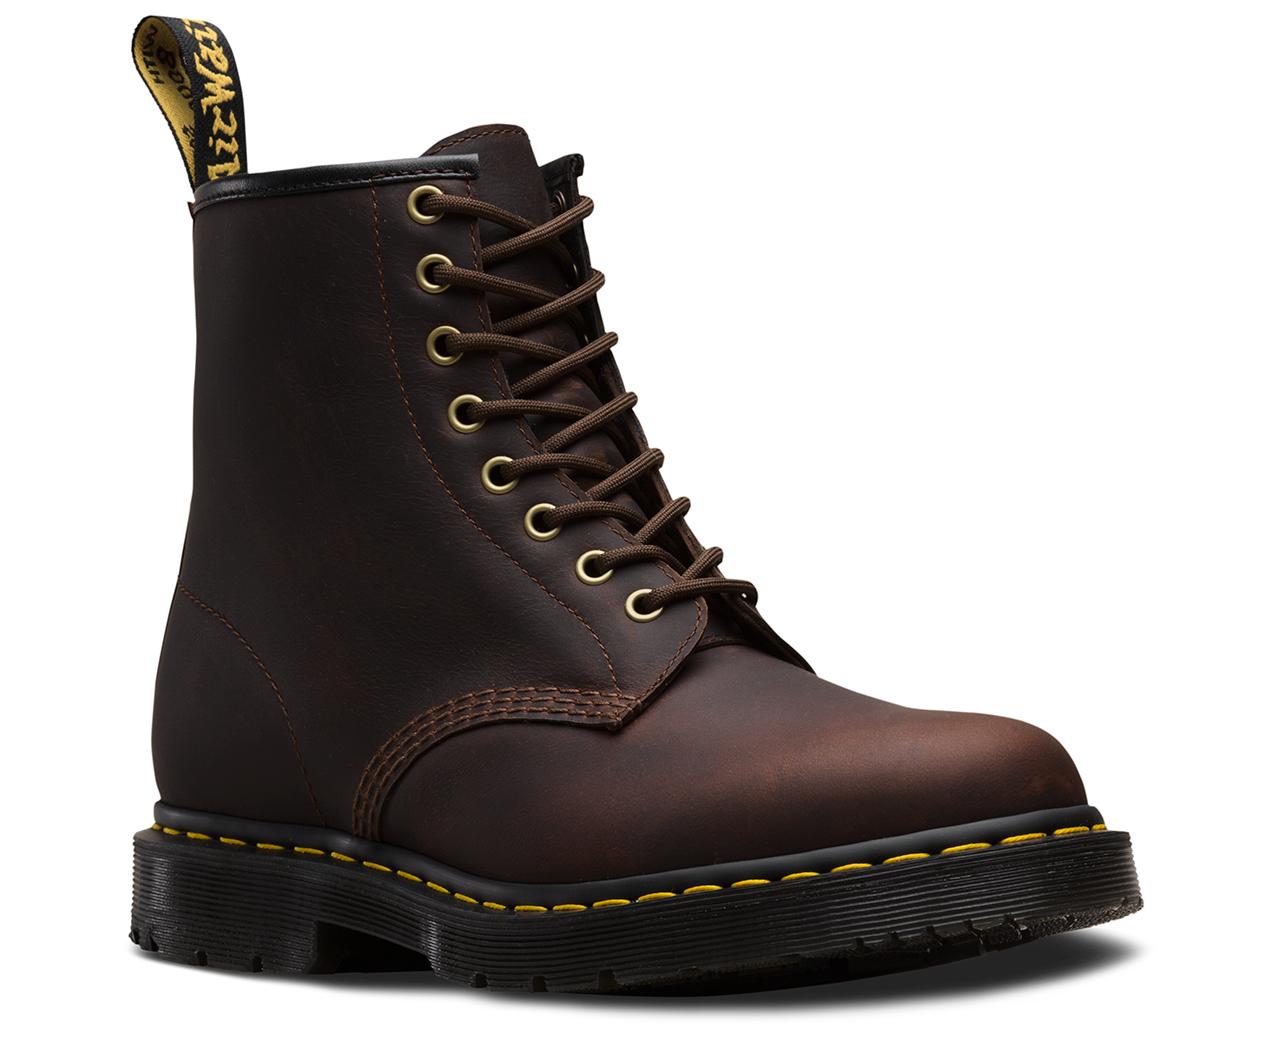 1460 dm 39 s wintergrip dm 39 s wintergrip boots shoes the official us dr martens store. Black Bedroom Furniture Sets. Home Design Ideas